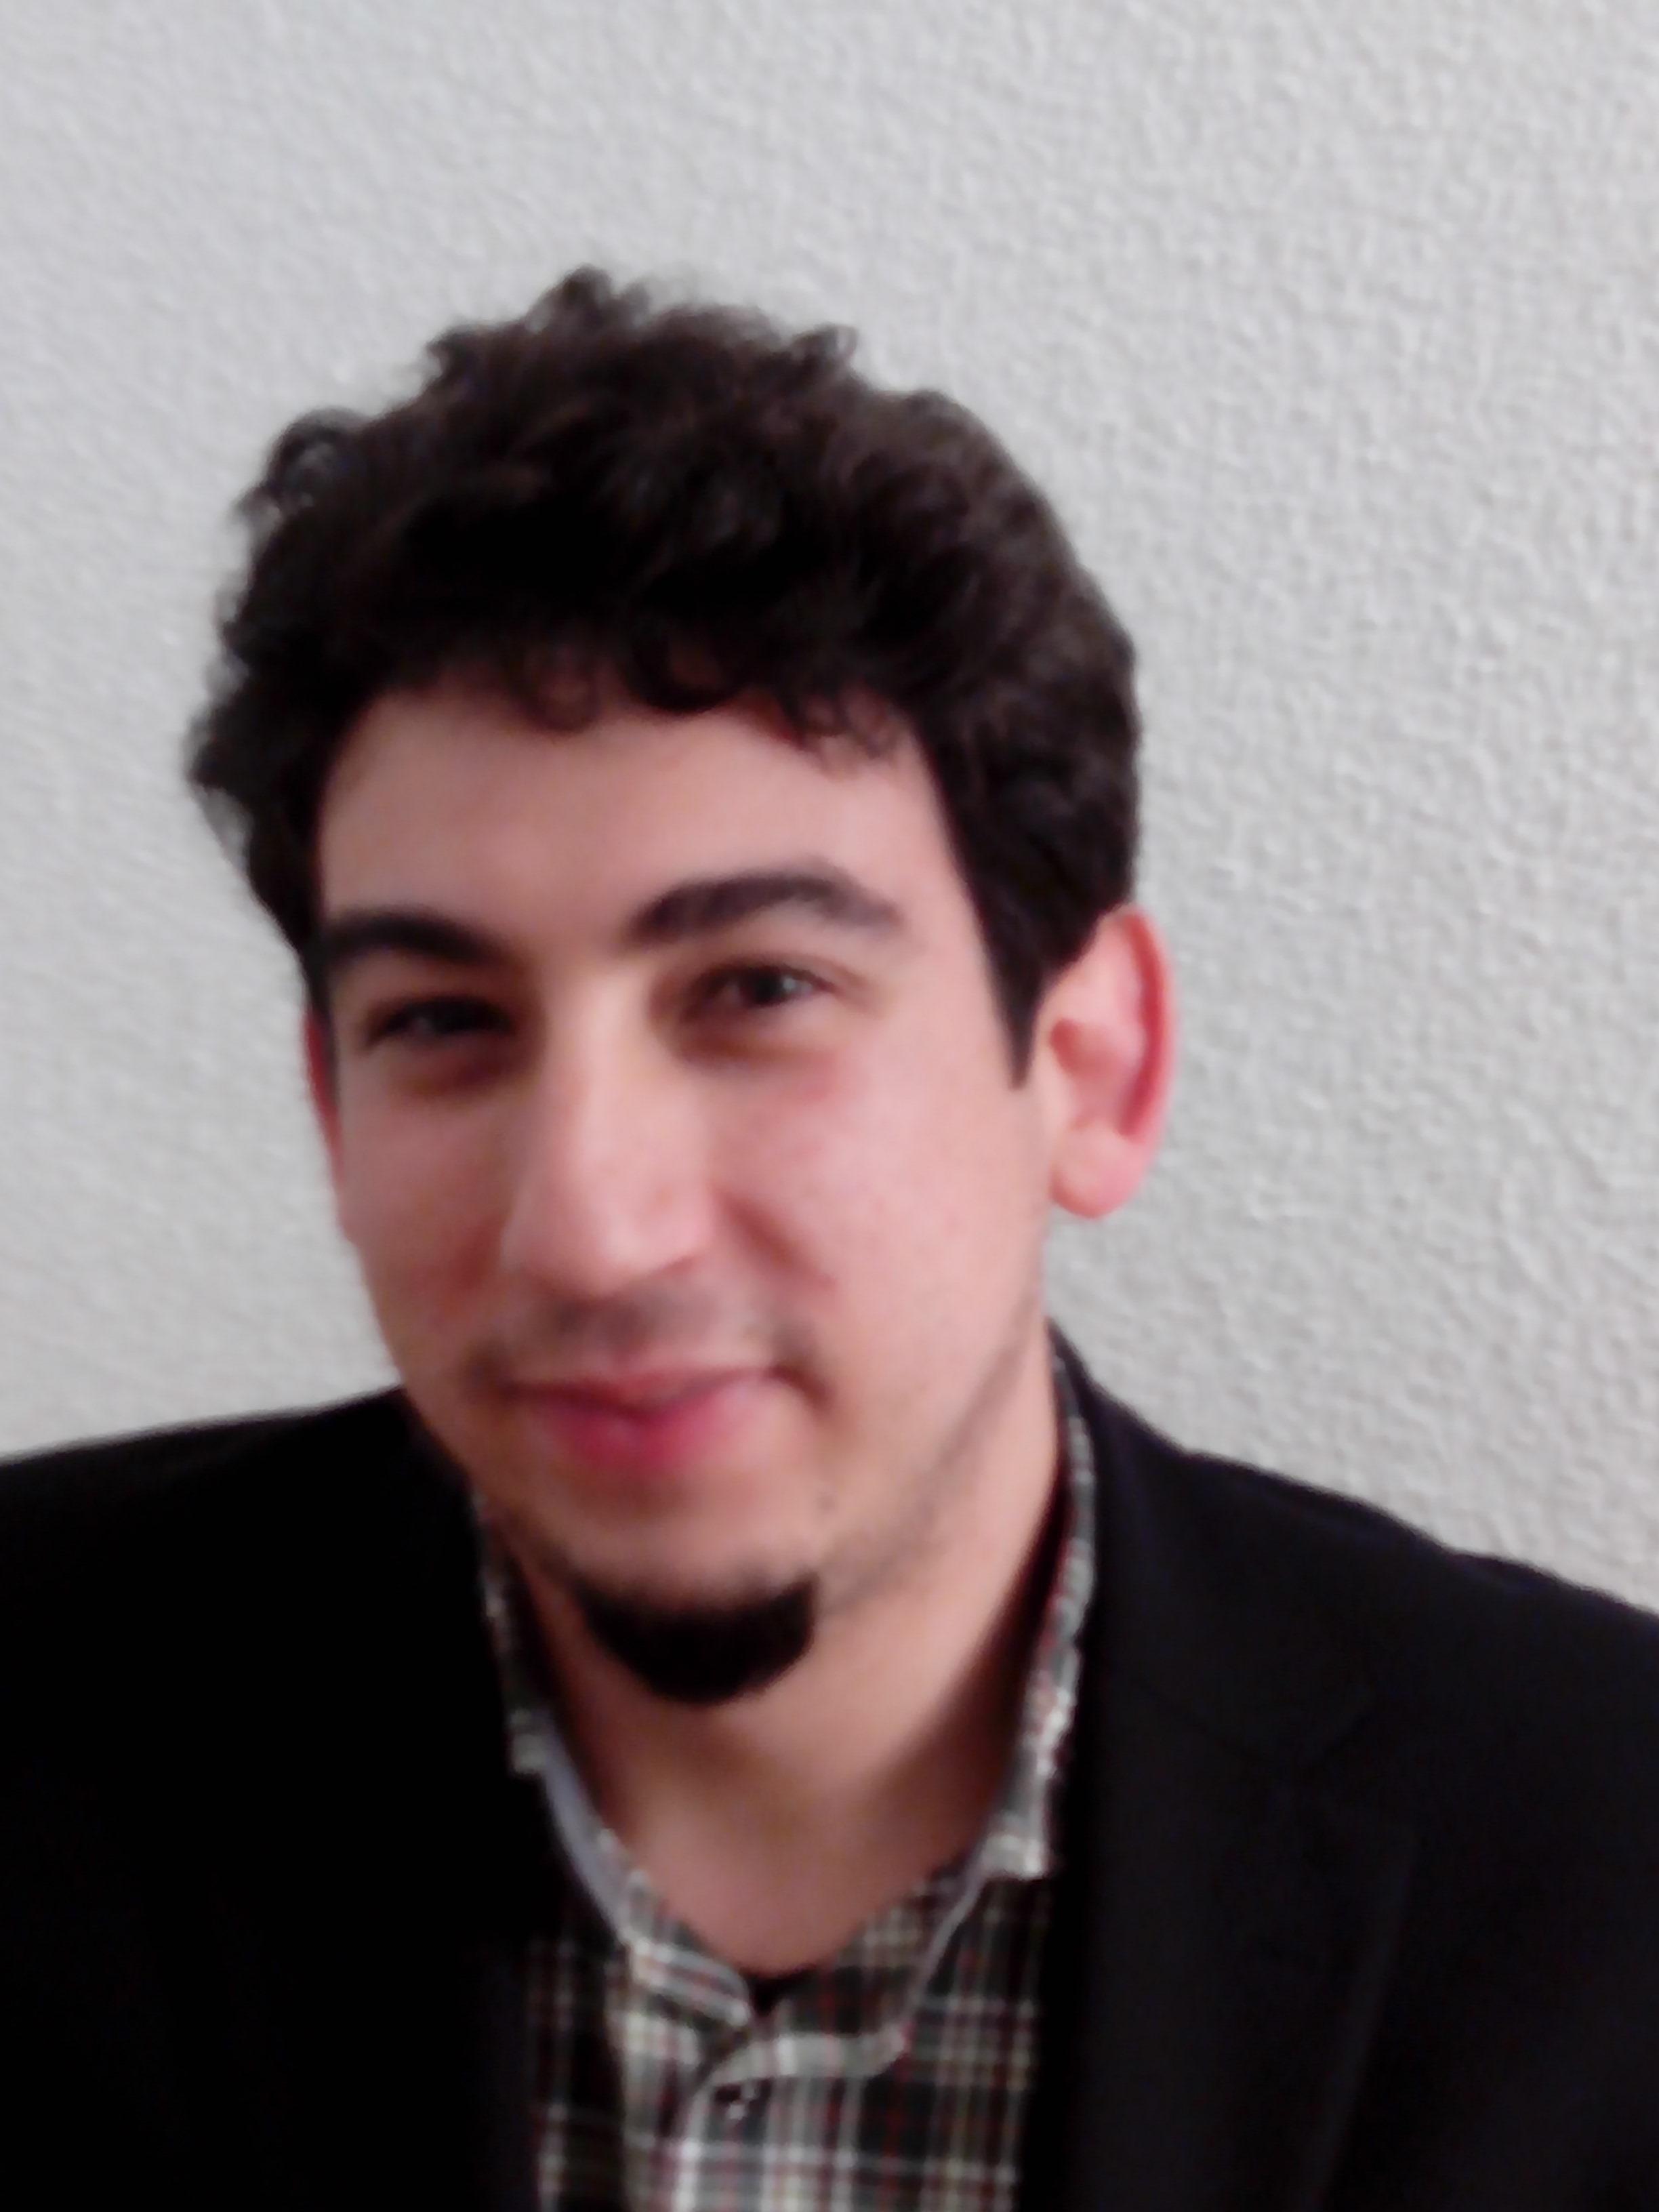 Hugo, psicólogo comprometido